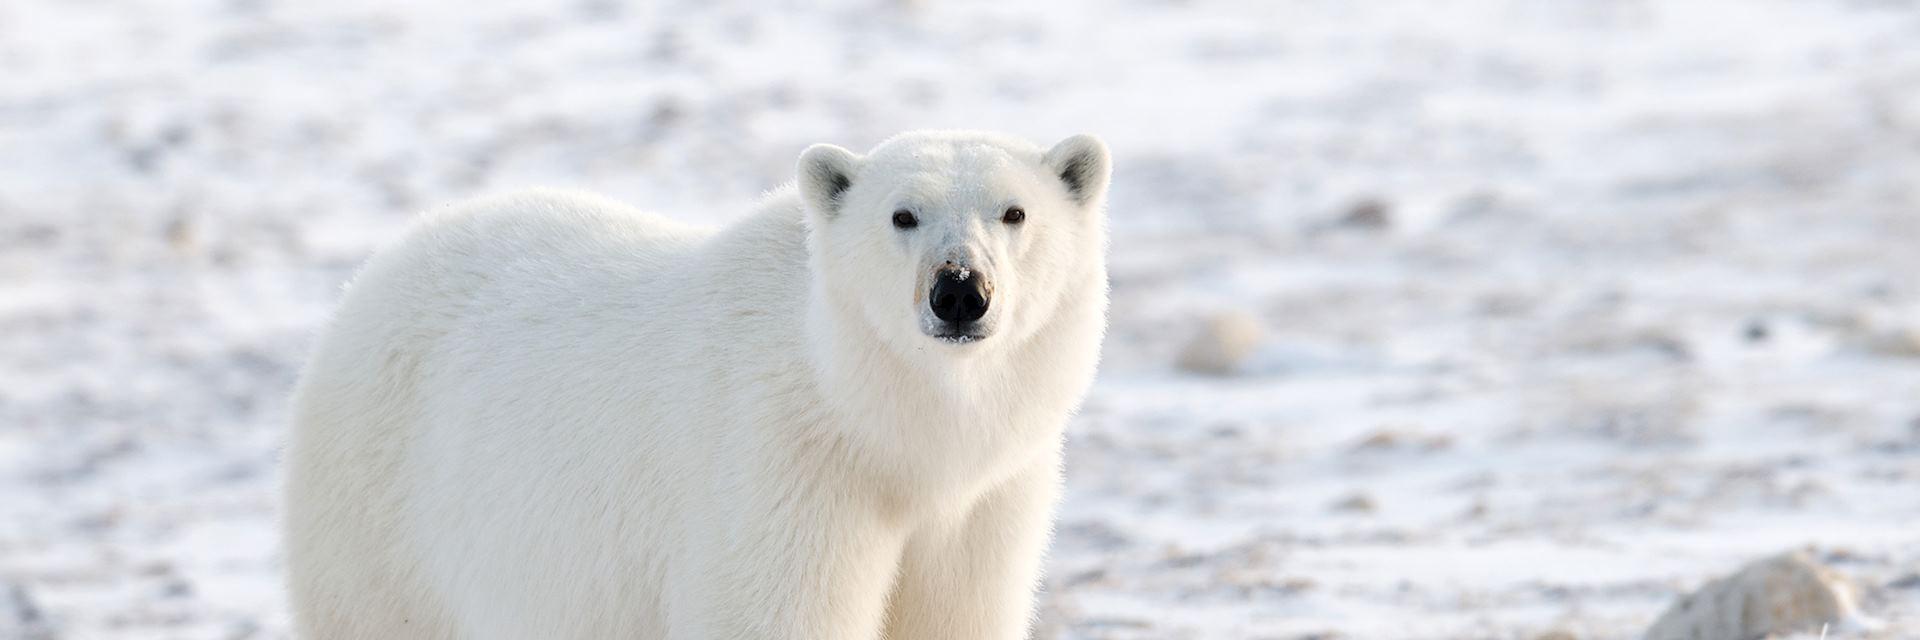 Polar bear on the tundra, Churchill, Canada